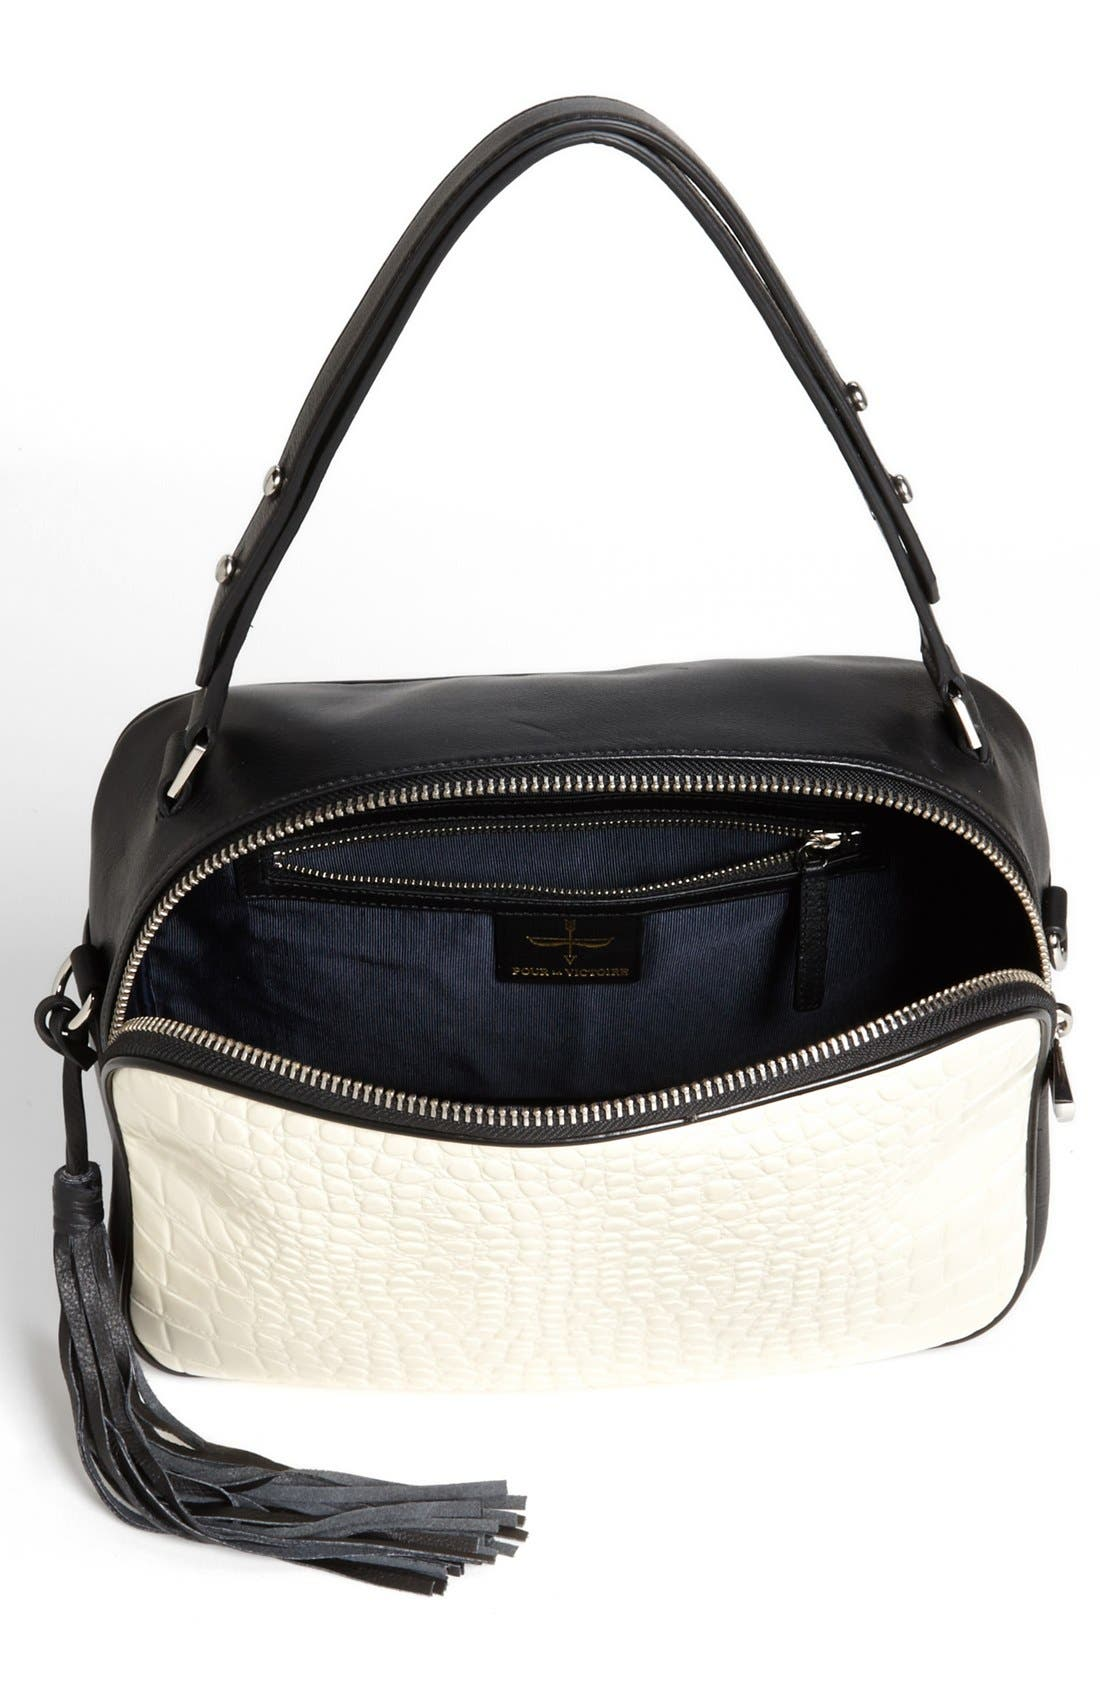 Alternate Image 3  - Pour la Victoire 'Nora' Leather Crossbody Bag